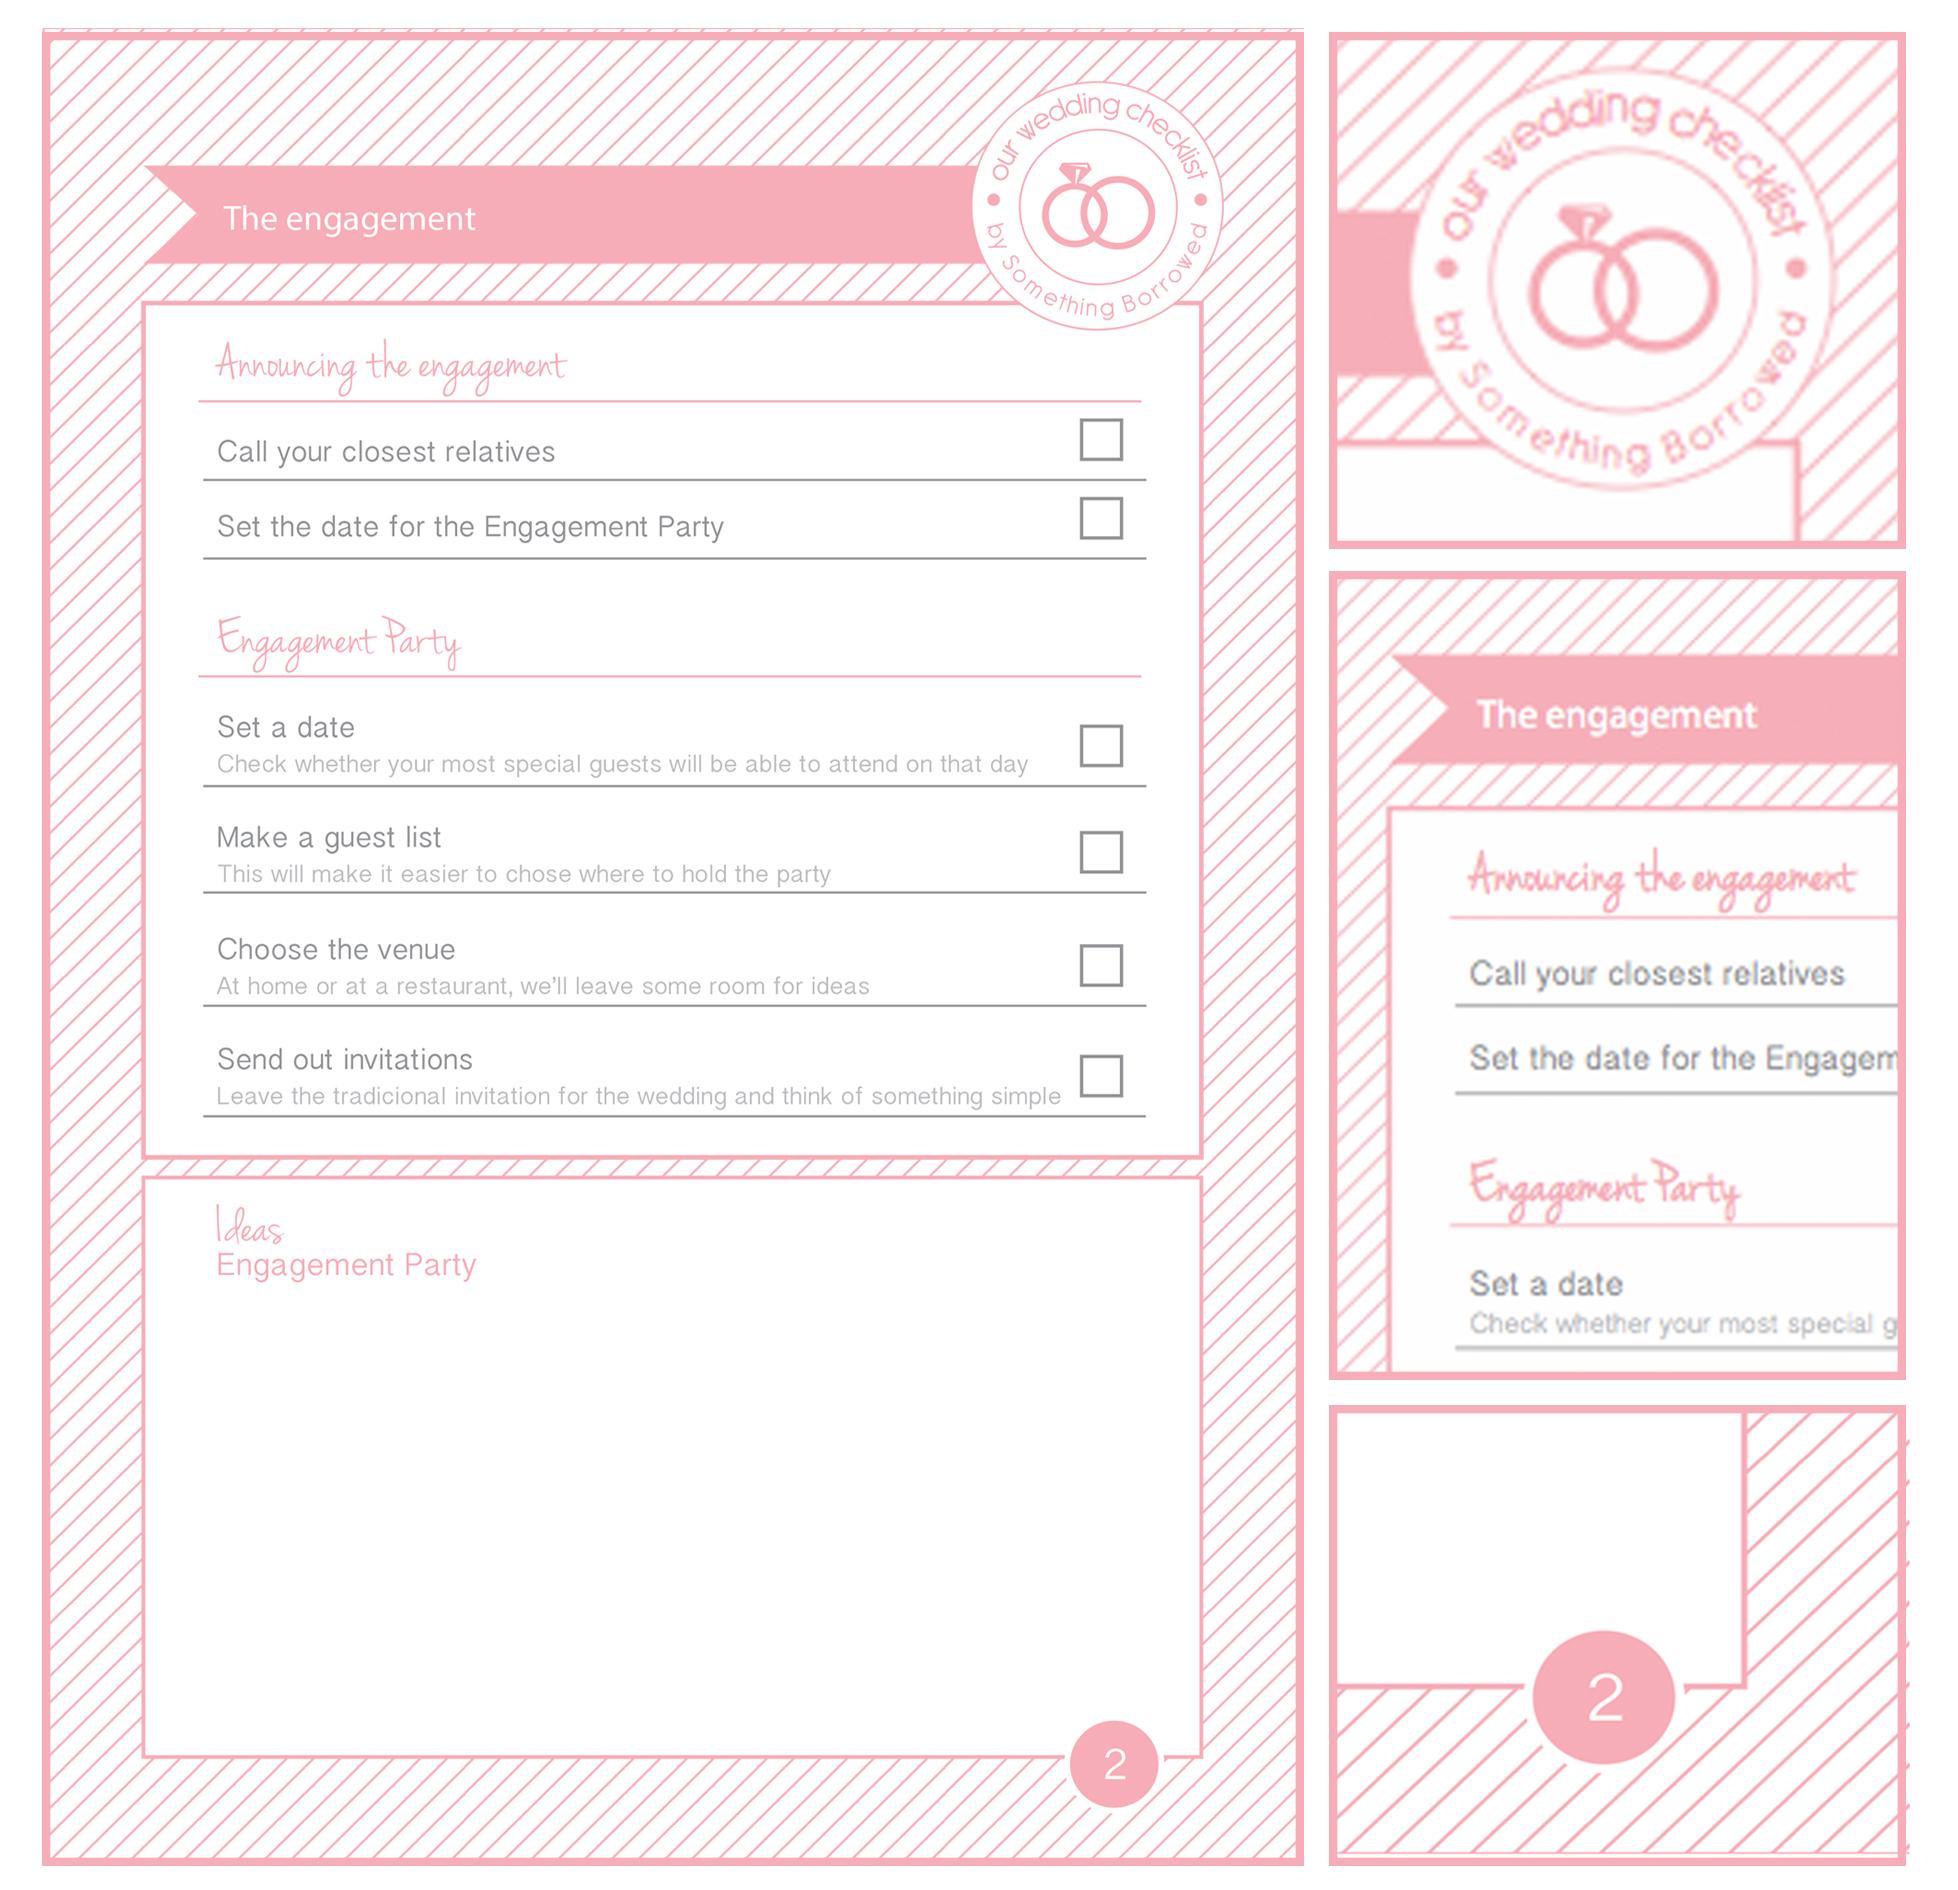 Free Printable Wedding Planner Book Online – Free Wedding Template - Make A Printable Picture Book Online Free